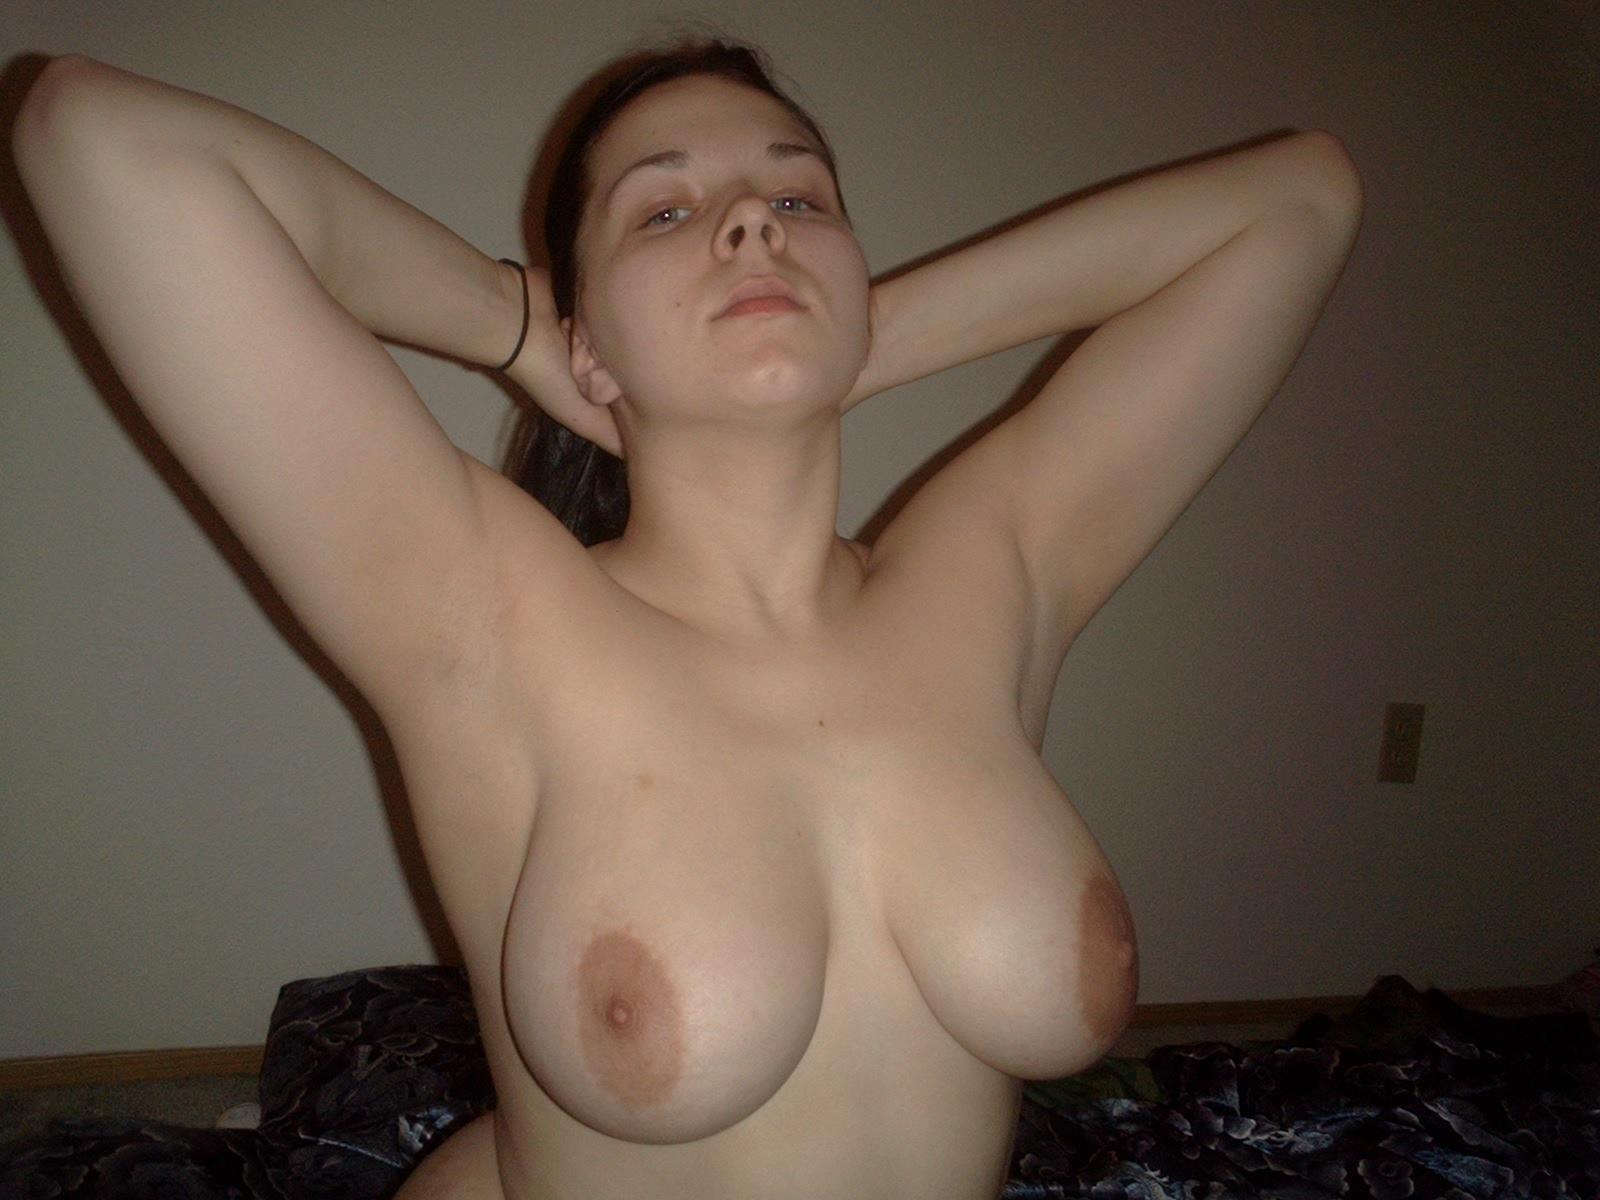 Fuking masheen with sexi girls pics